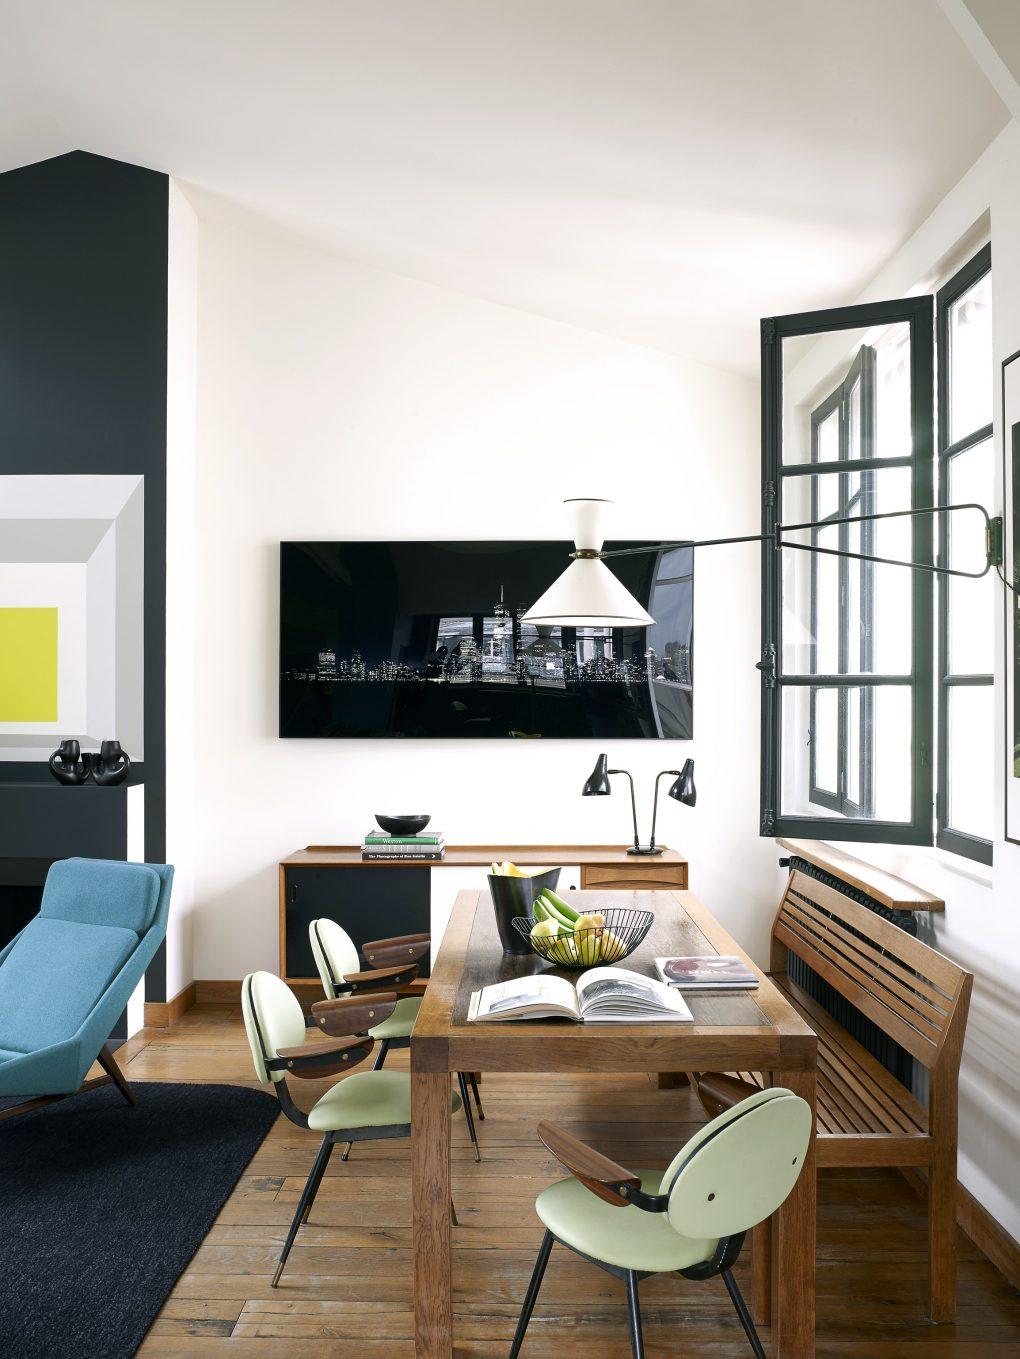 paris loft Inside An Eclectic Mix Of Furniture Paris Loft Inside An Eclectic Mix Of Furniture Paris Loft 4